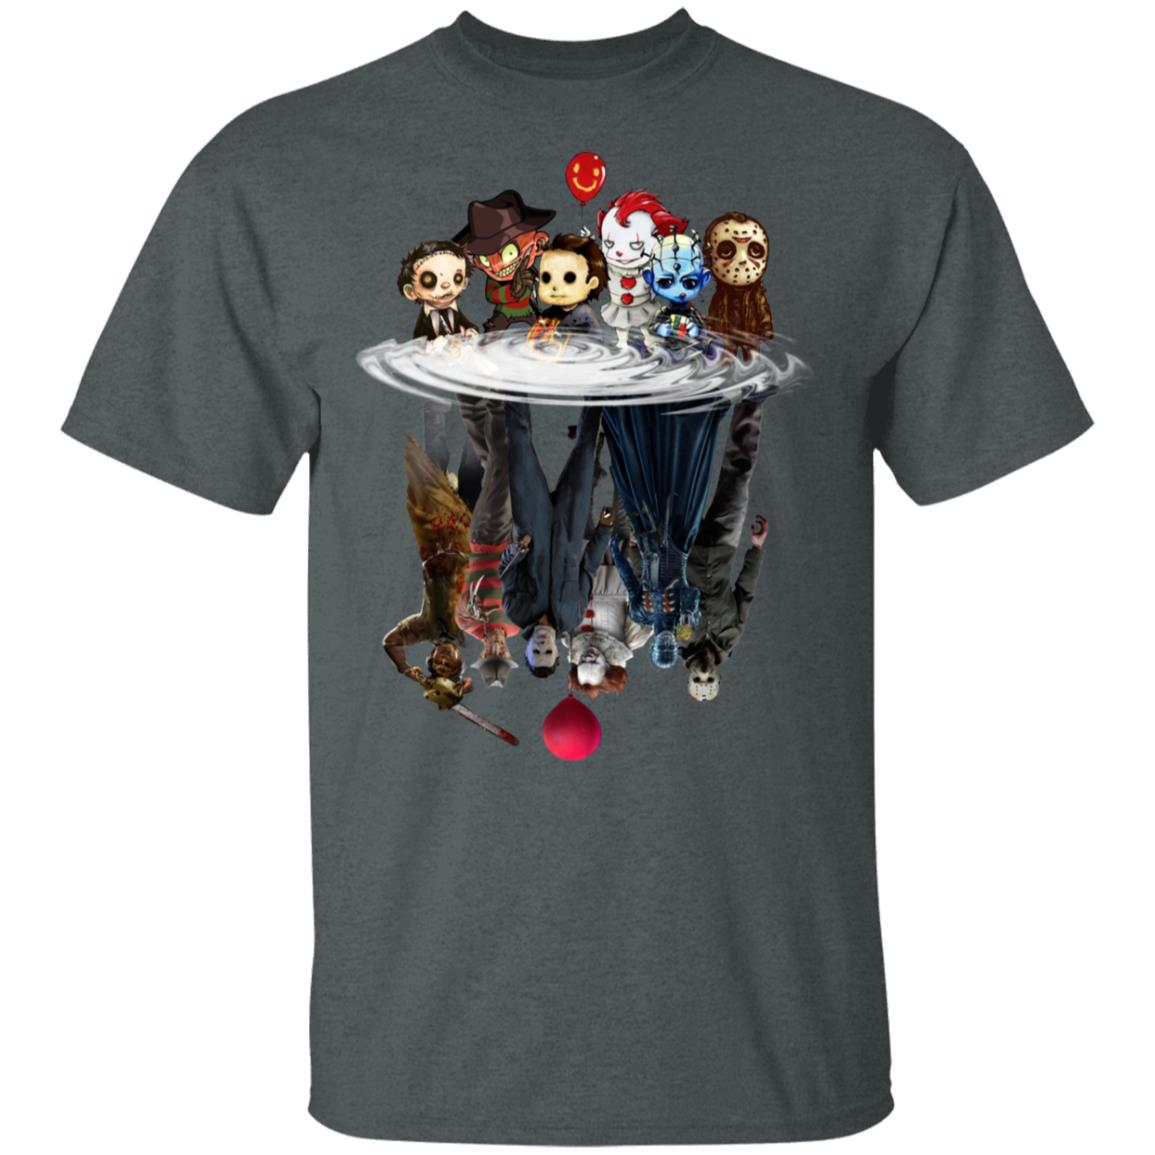 Horror characters movies water mirror reflection shirt TShirt Unisex Hoodie Sweatshirt For Mens Womens Ladies